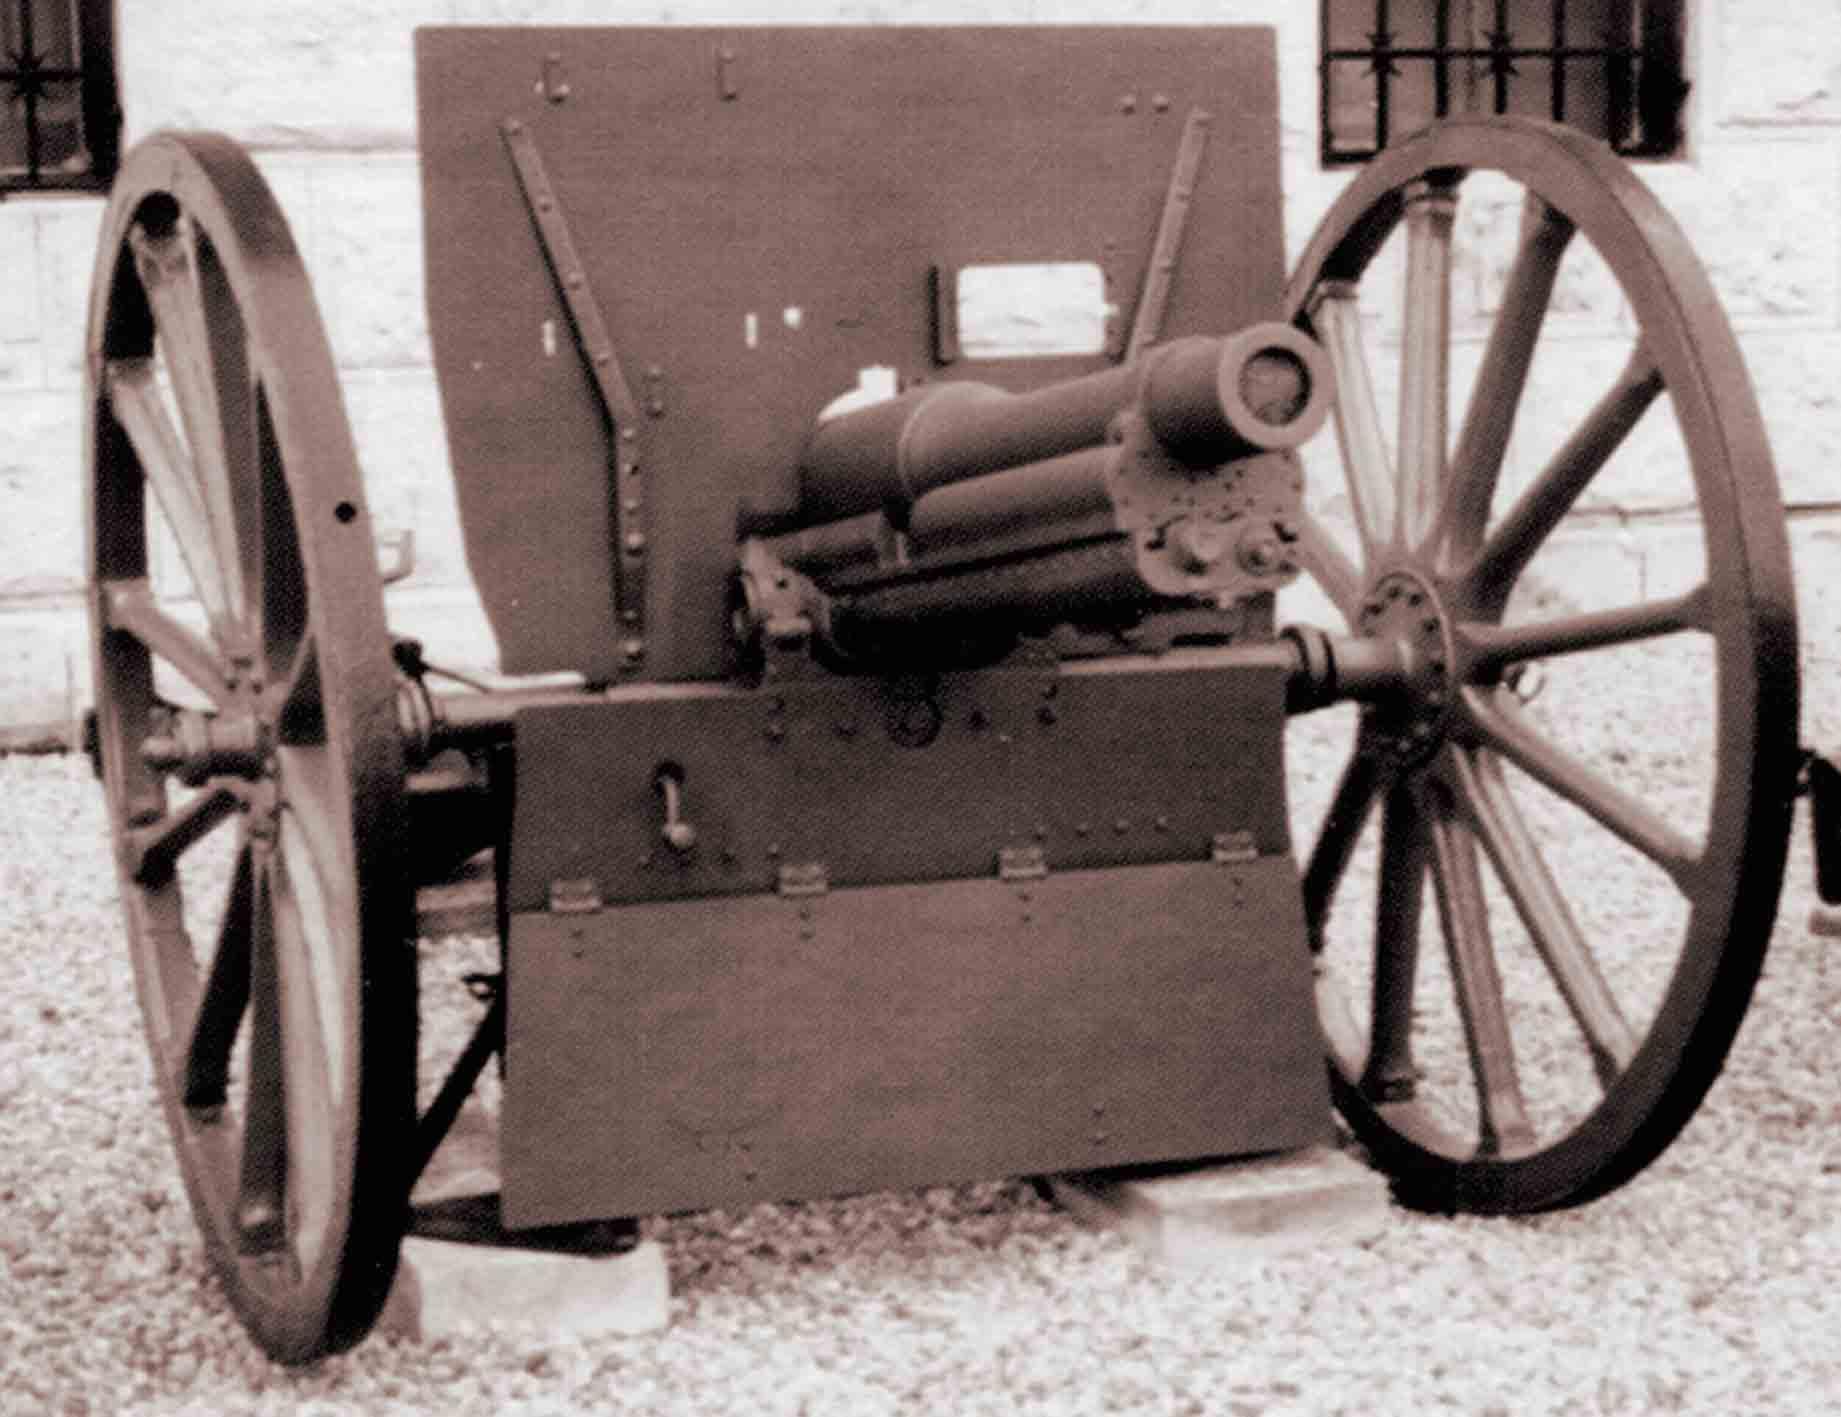 Armata polowa wz. 1912 kal. 75 mm